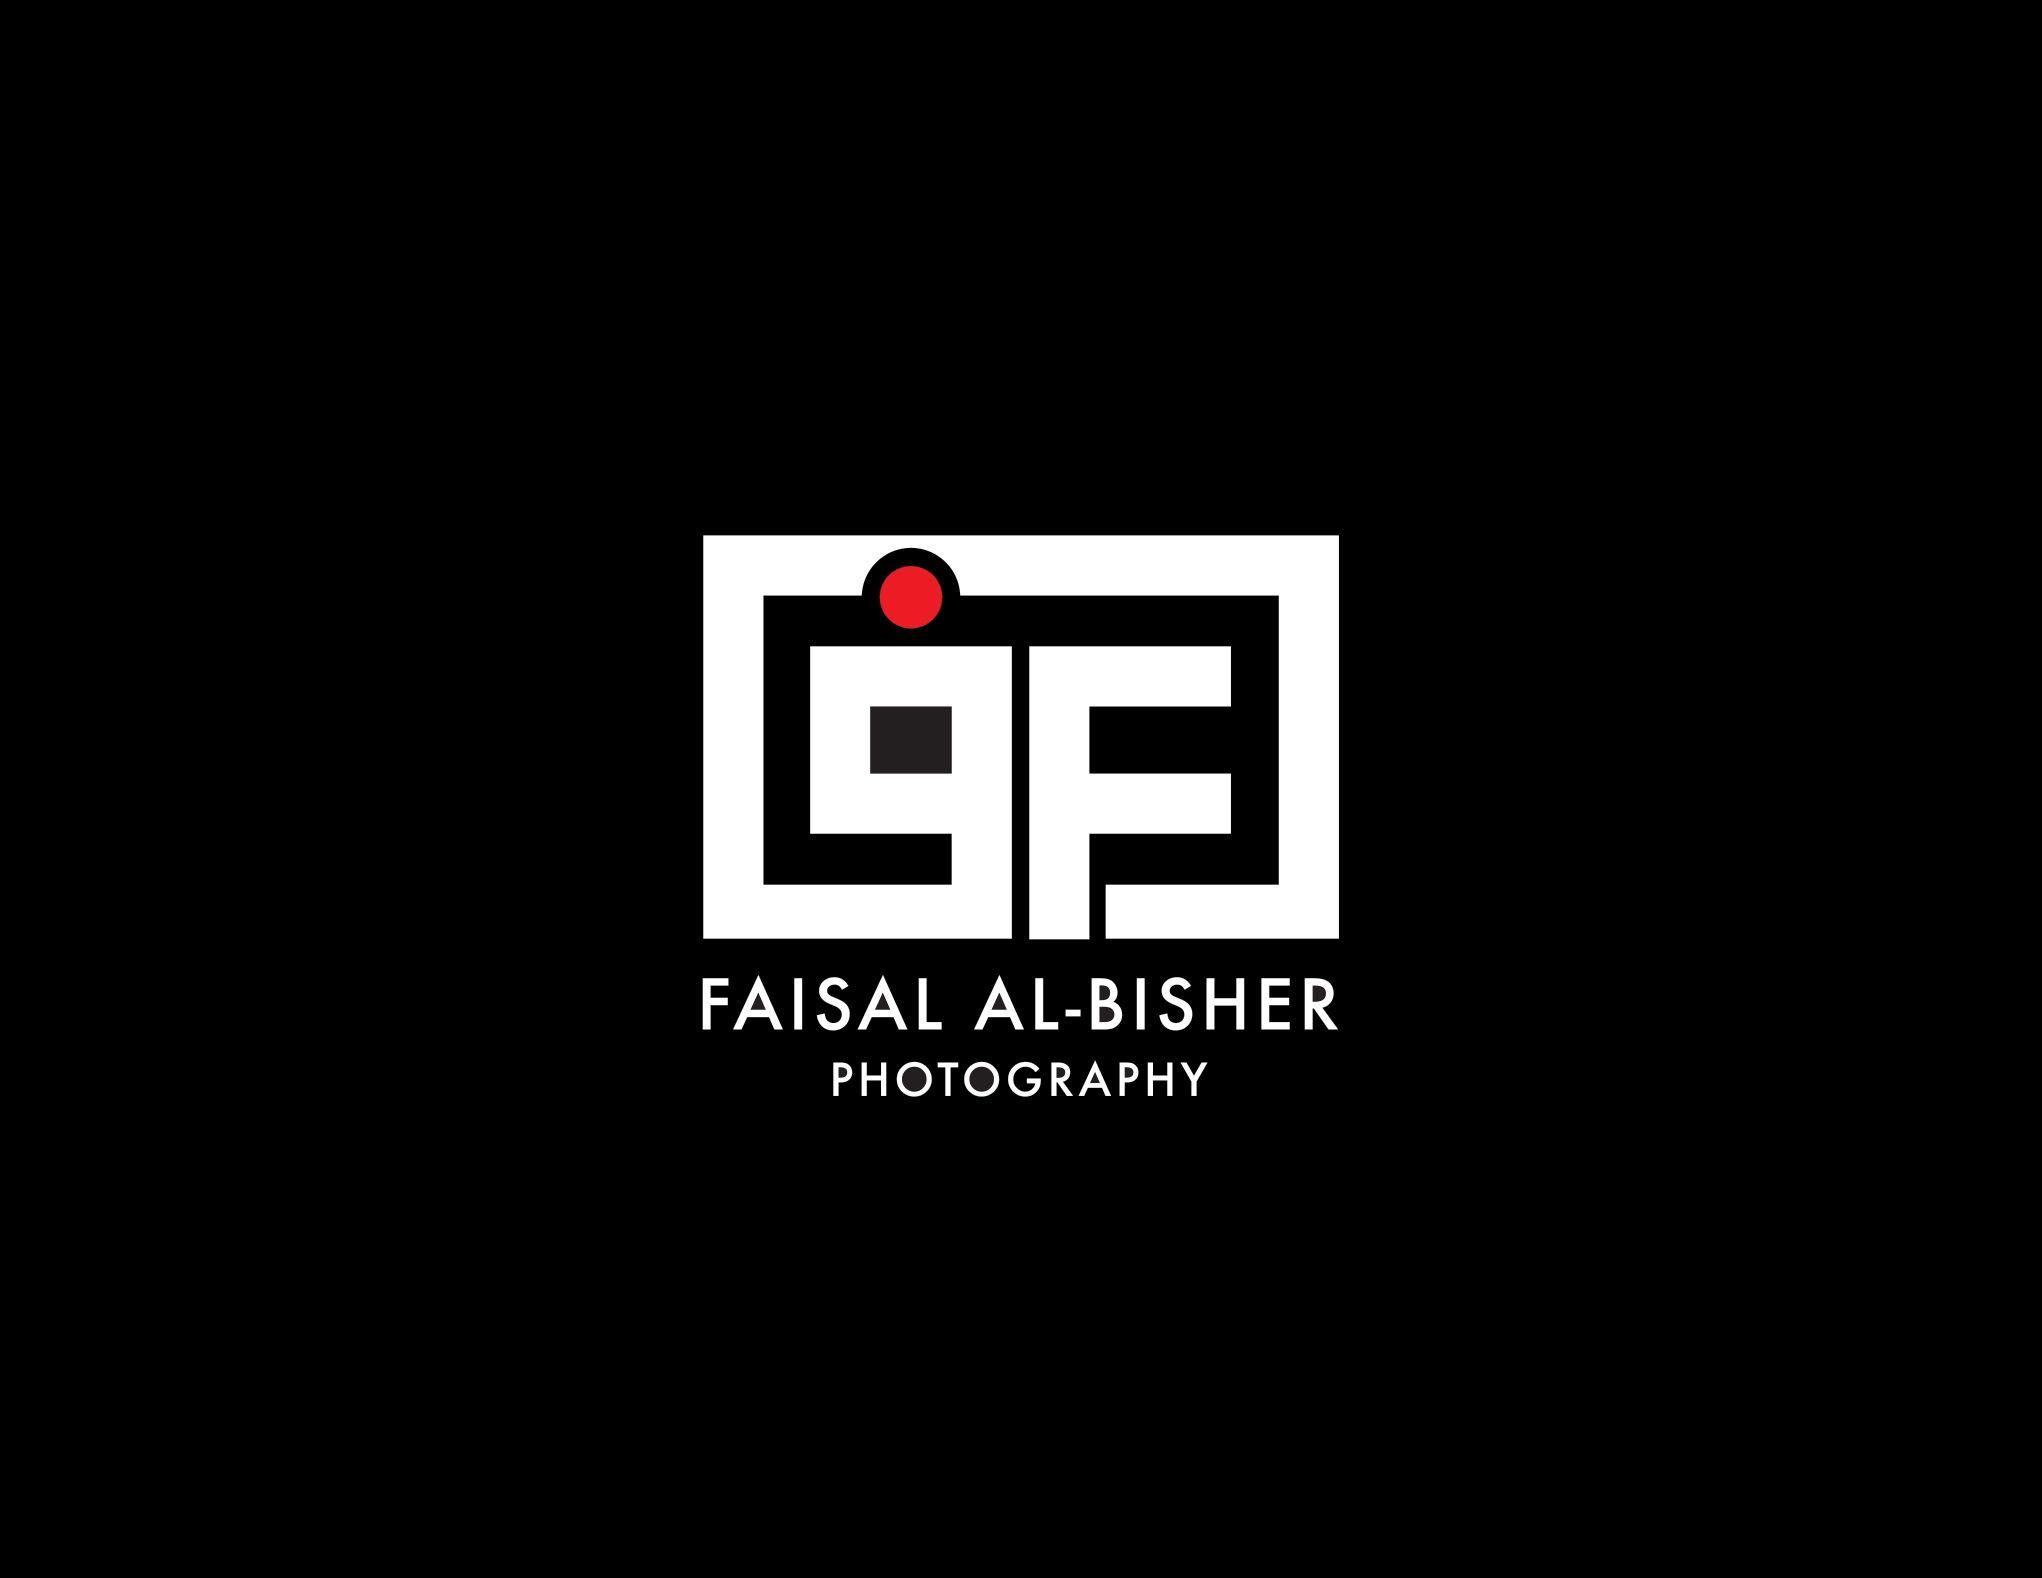 Faisal Al-Bisher